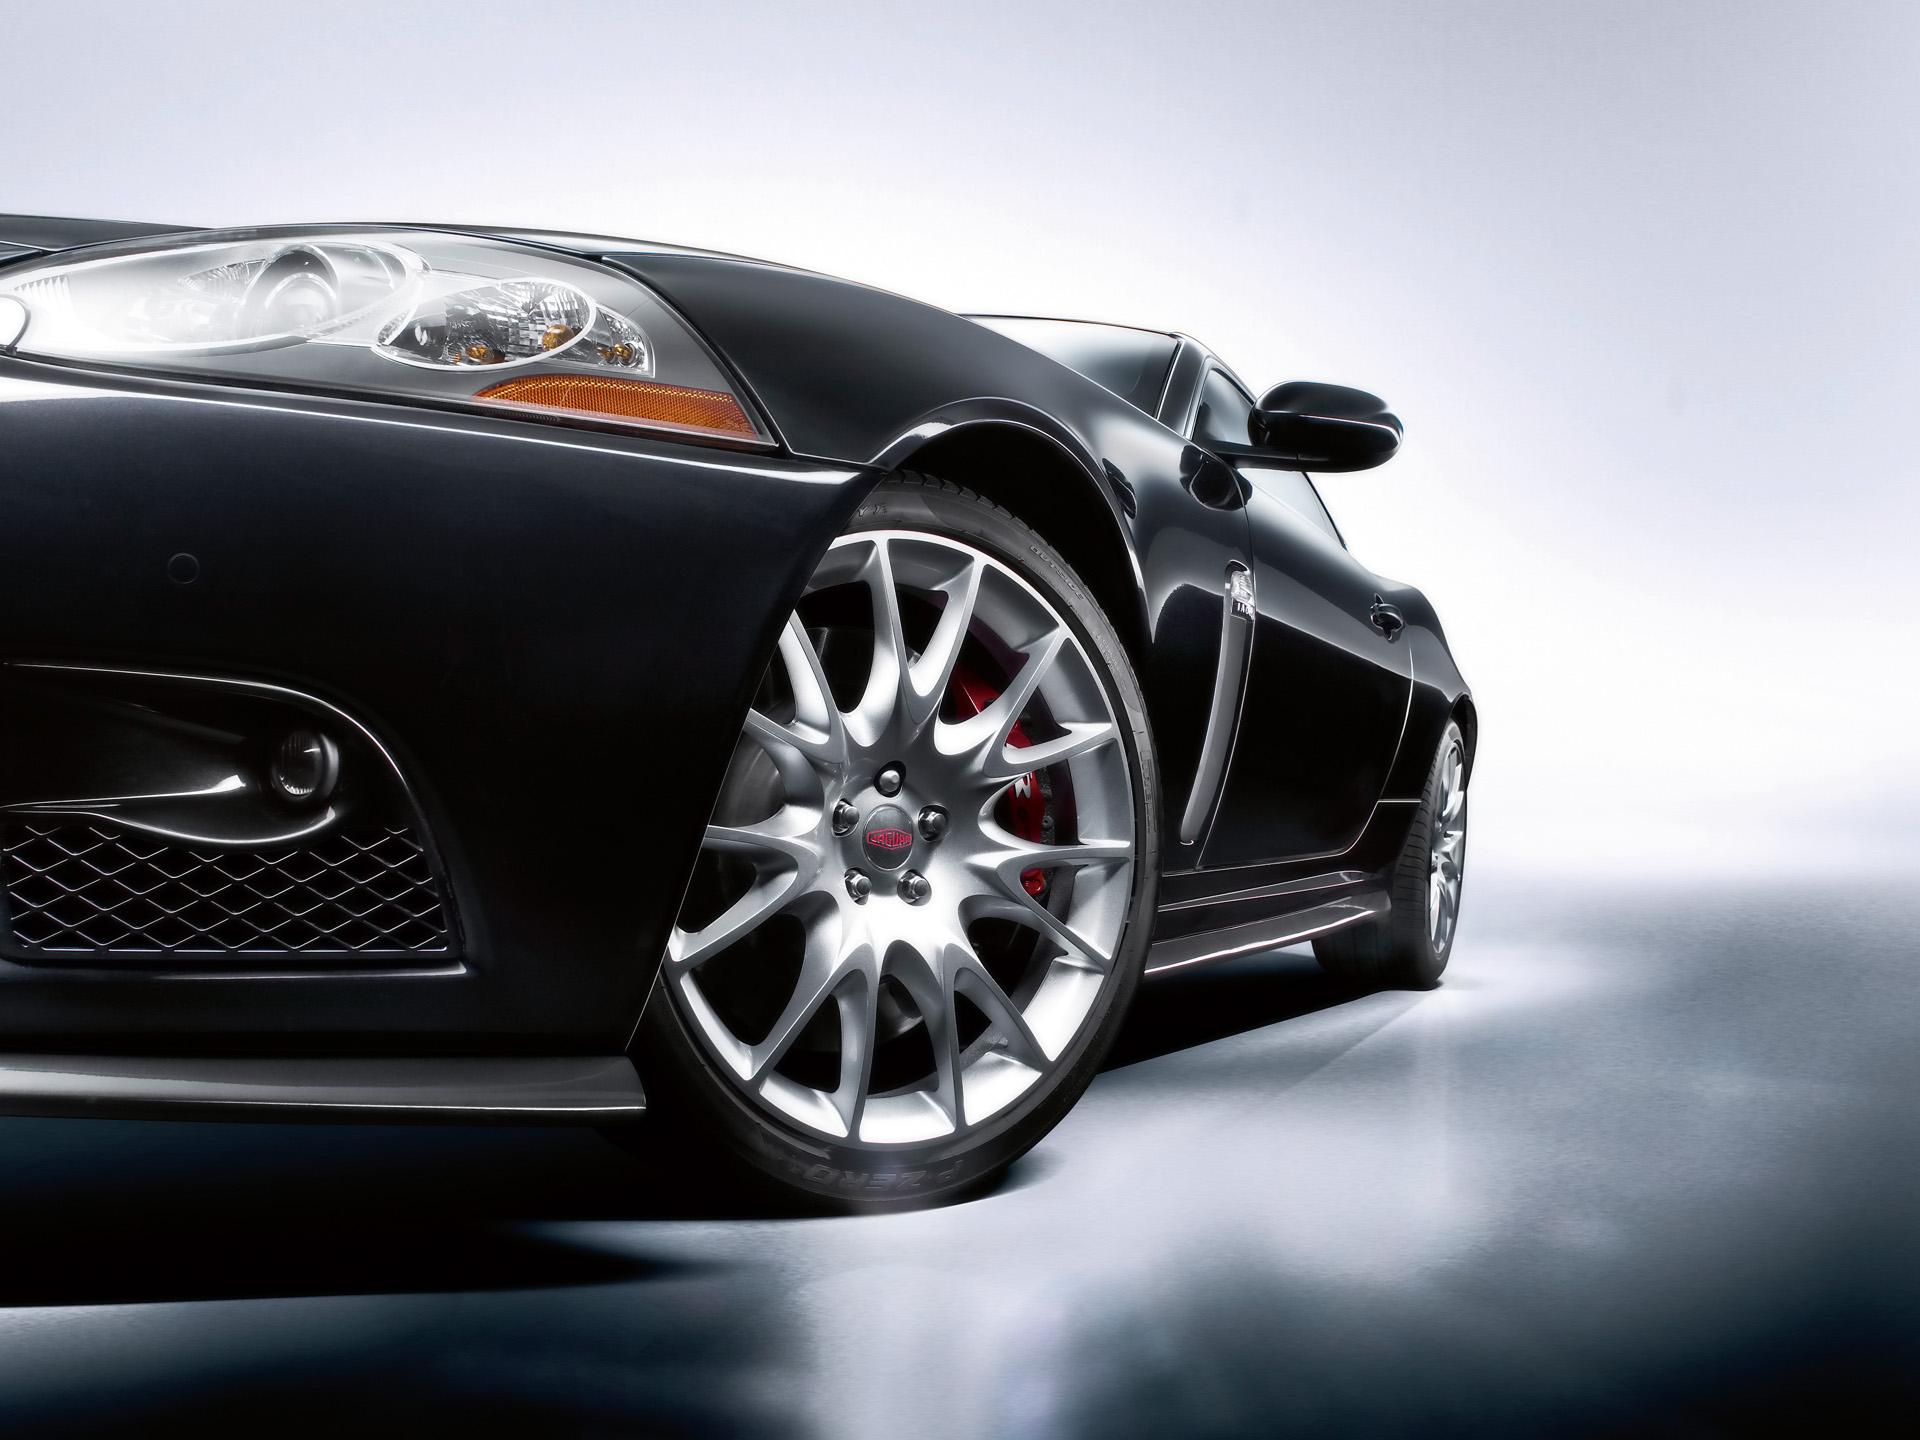 2008 Jaguar XKR S Studio Section Wallpaper Free For Tablet